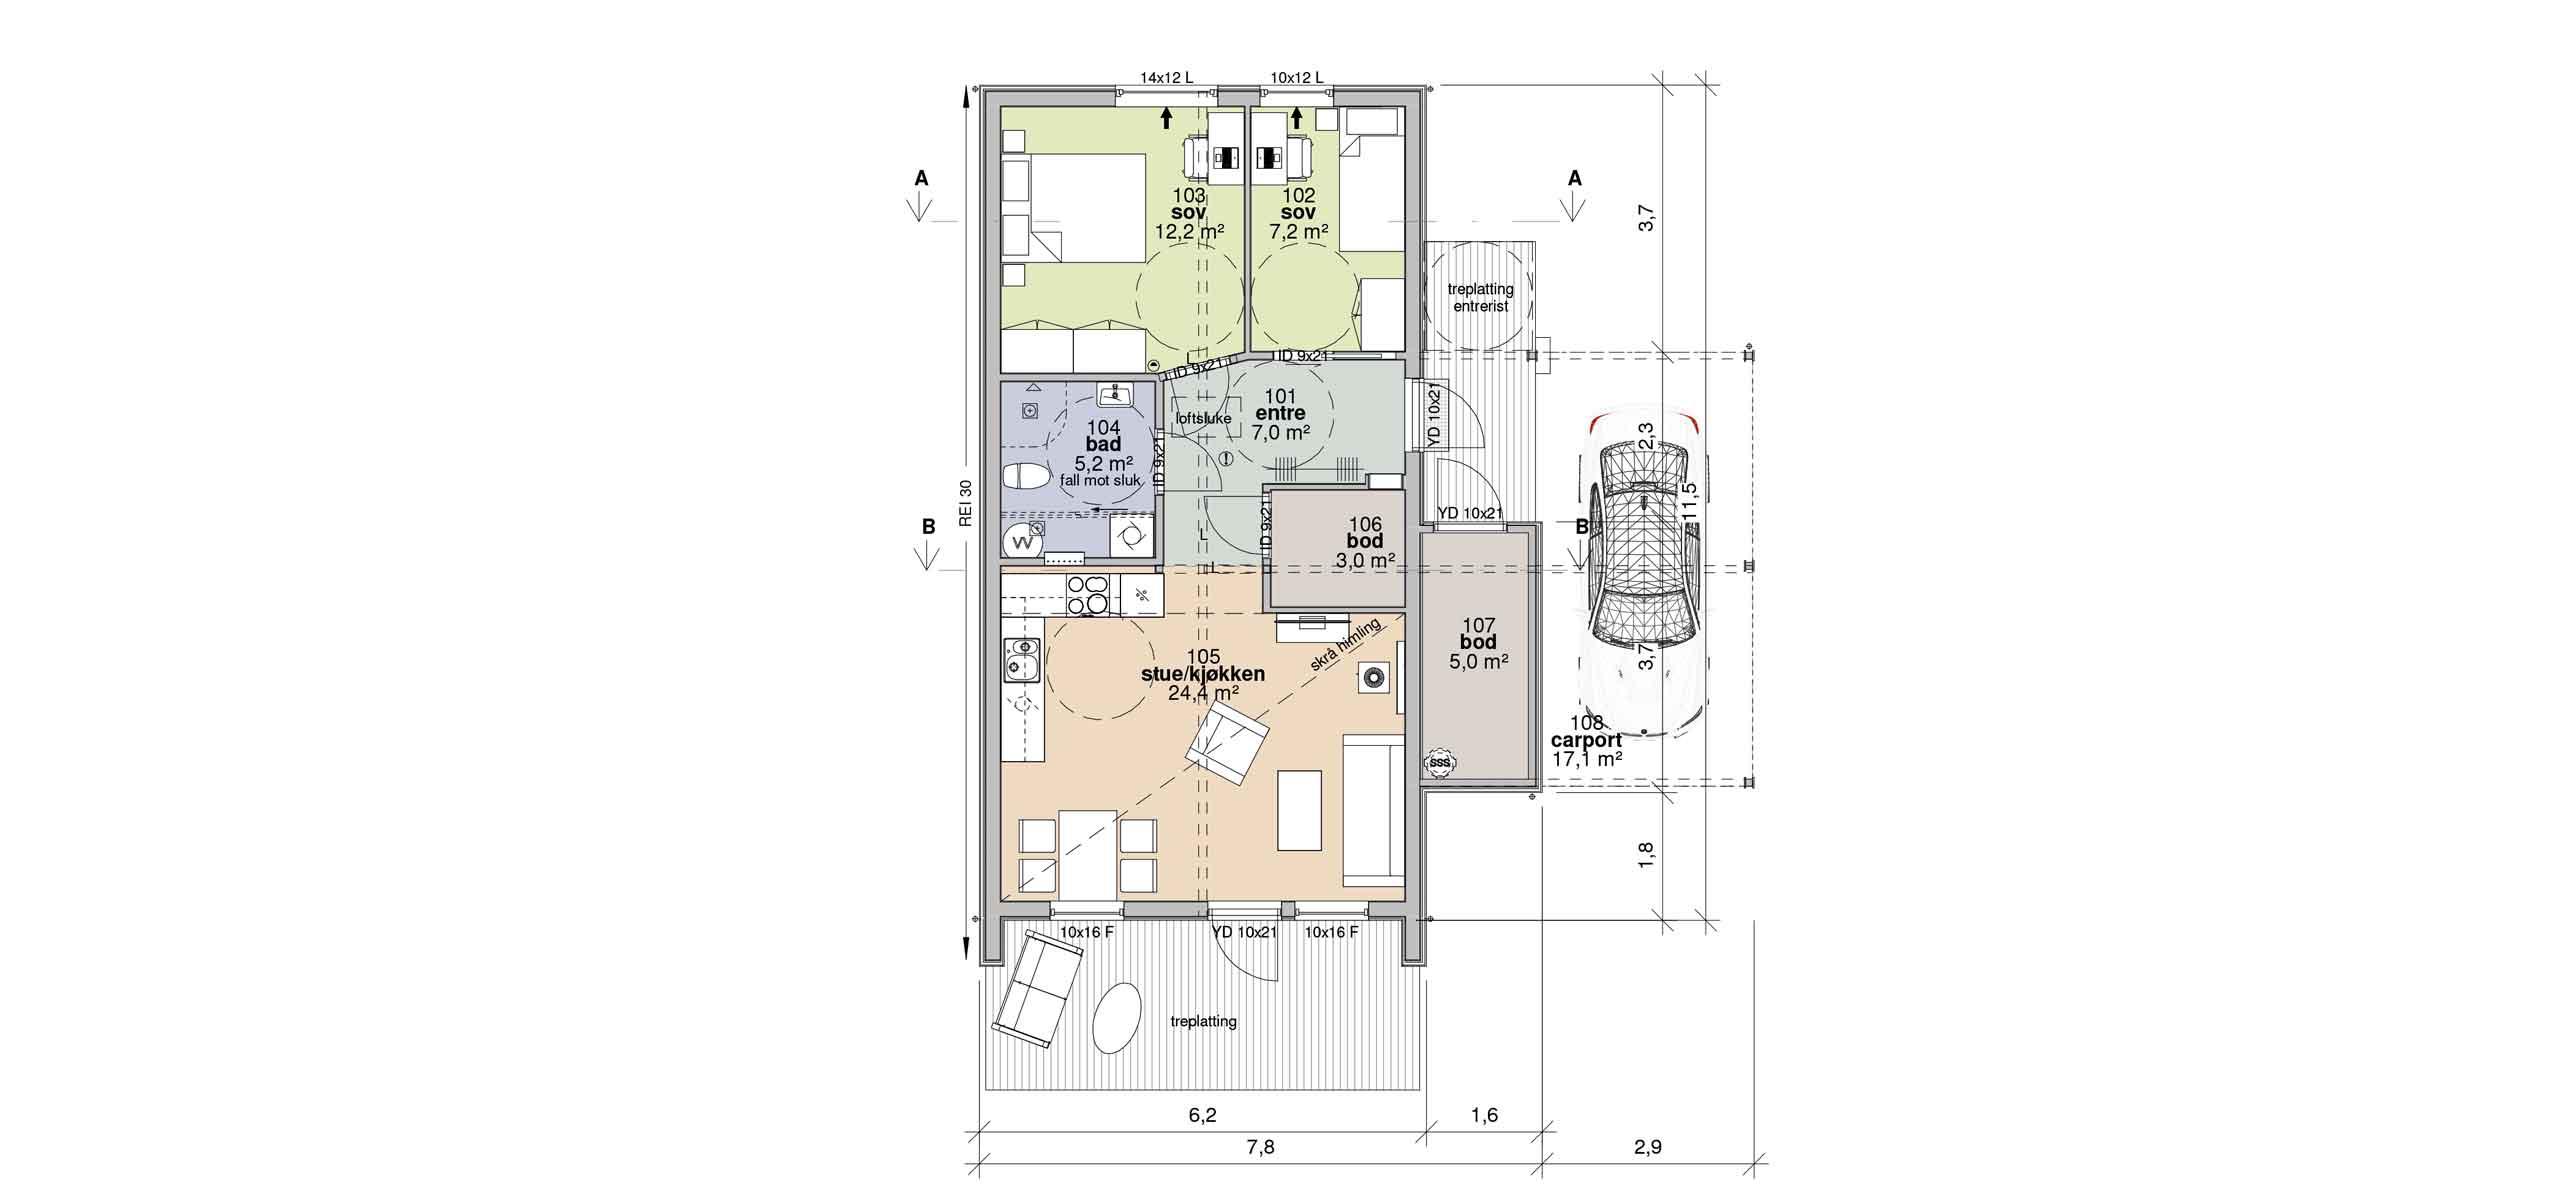 Plan Bolig A m/Carport